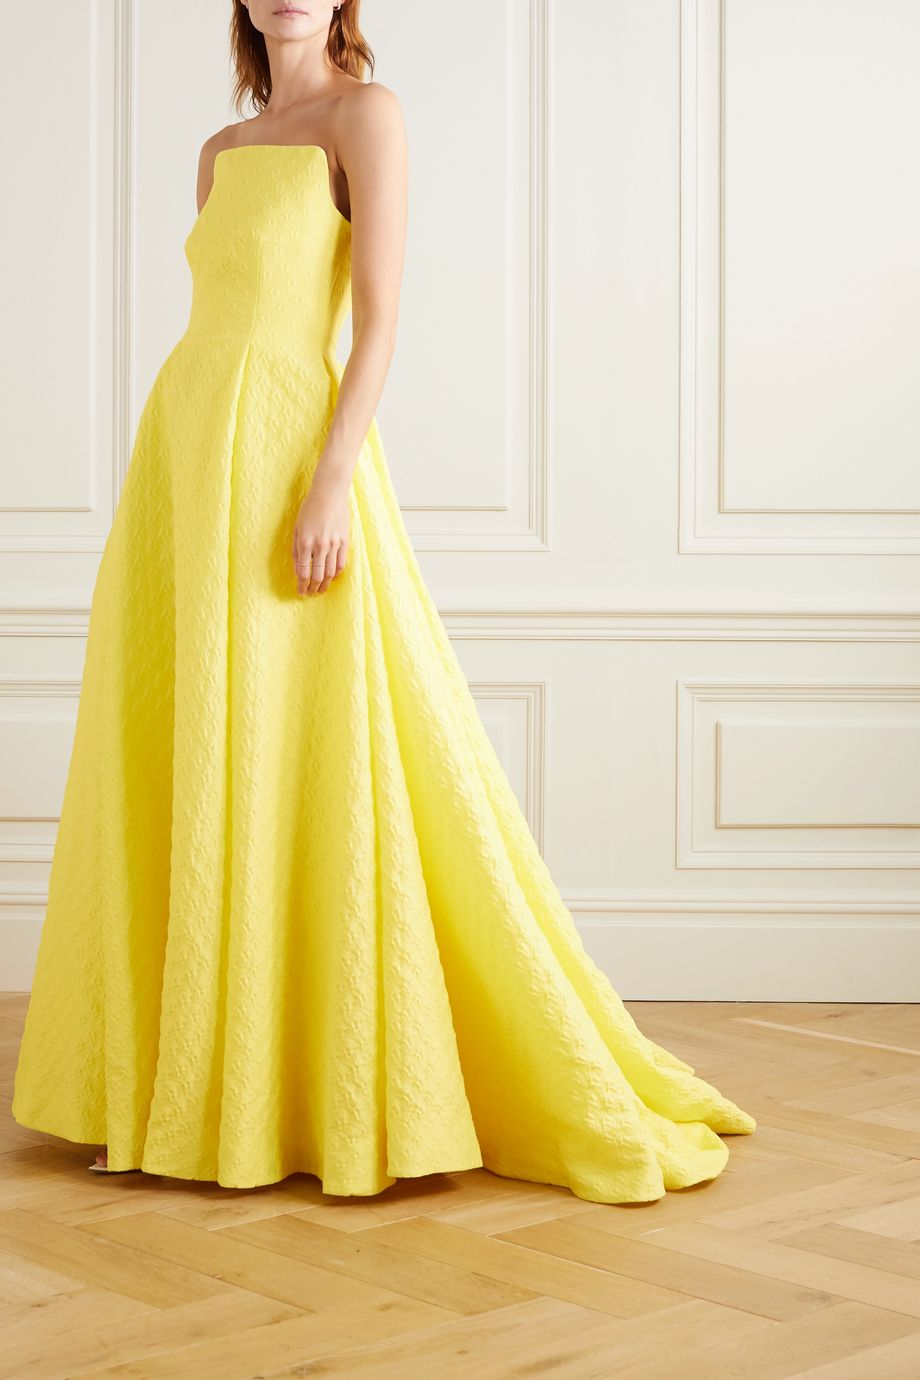 Emilia Wickstead Abigail strapless cloqué gown